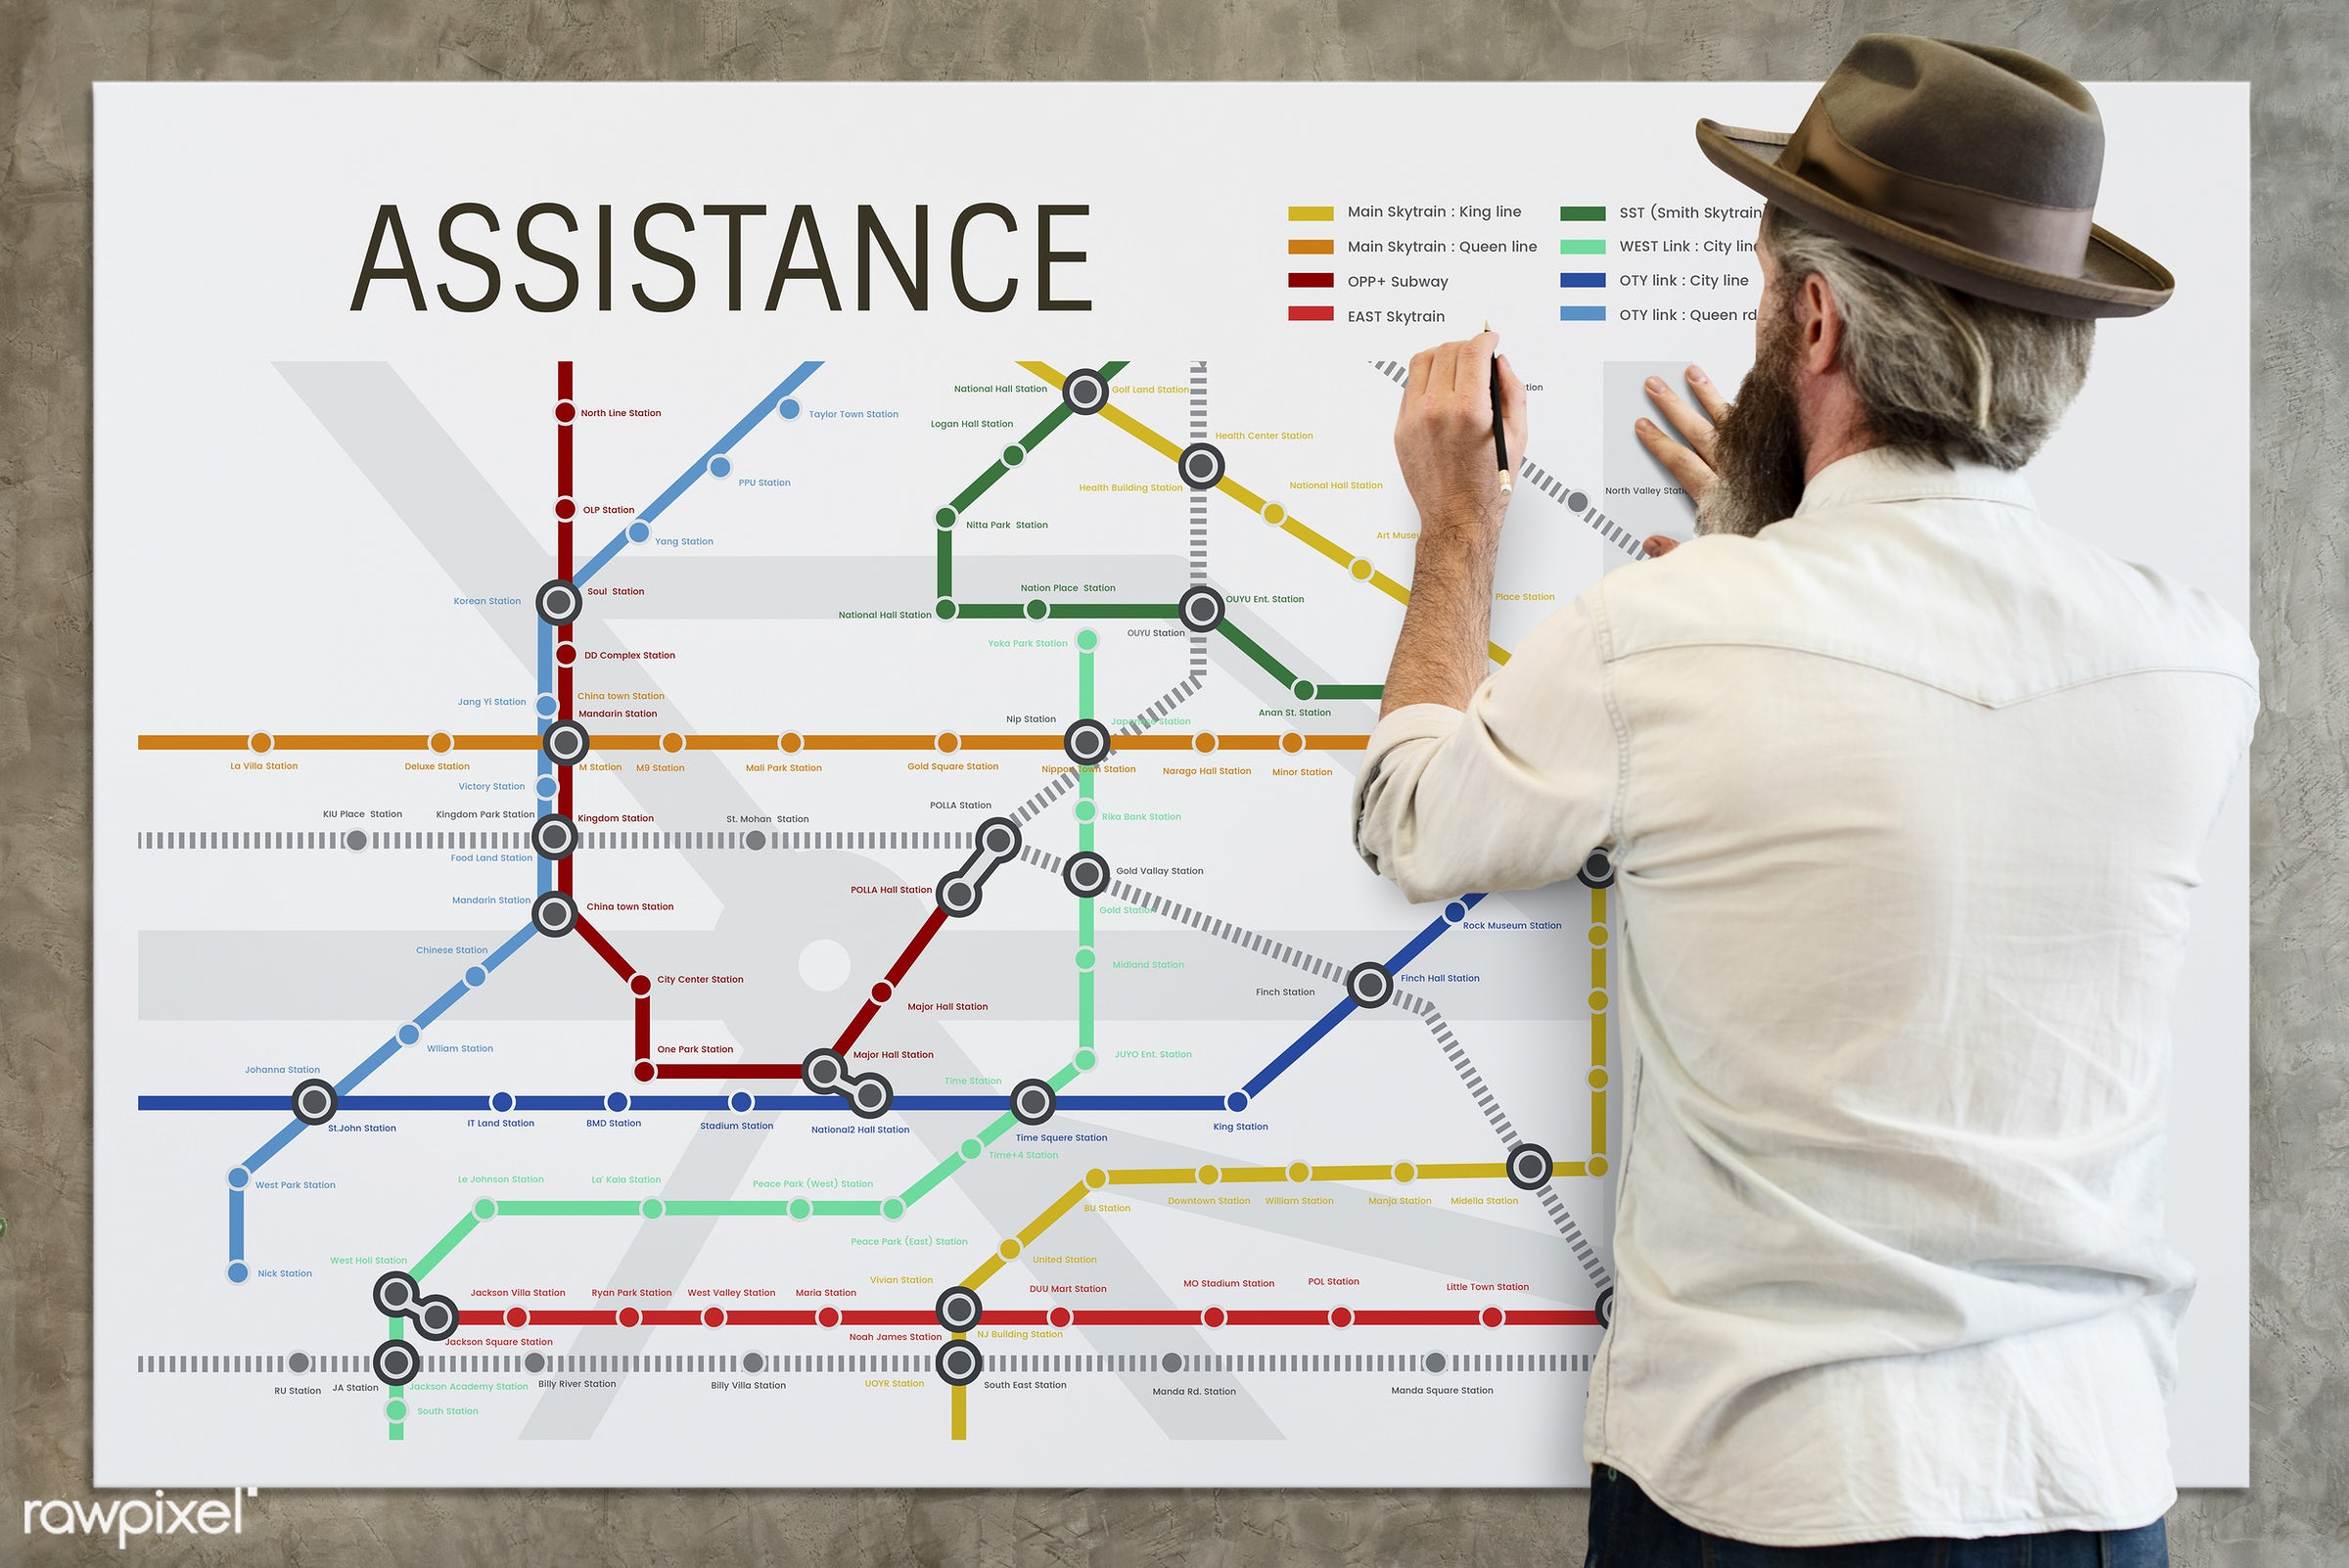 adult, alone, assistance, back, be creative, beard, beard guy, board, bus, carefree, casual, chill, create, creative,...